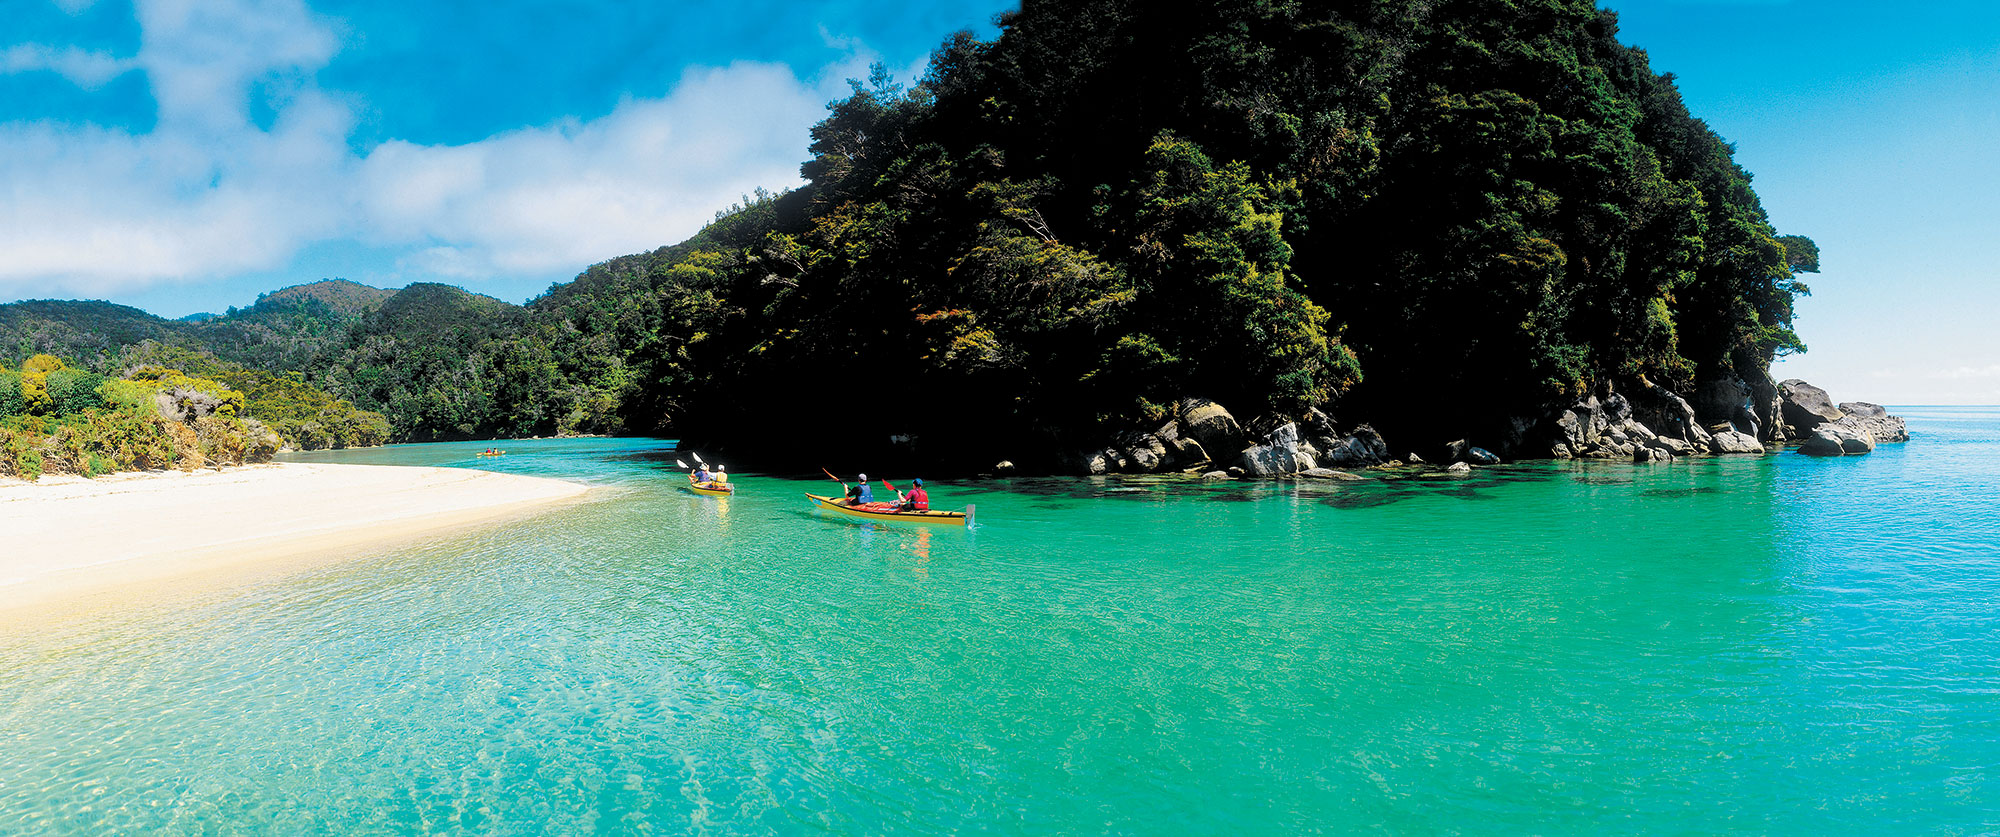 New Zealand Honeymoon Adventure Down Under Endeavours